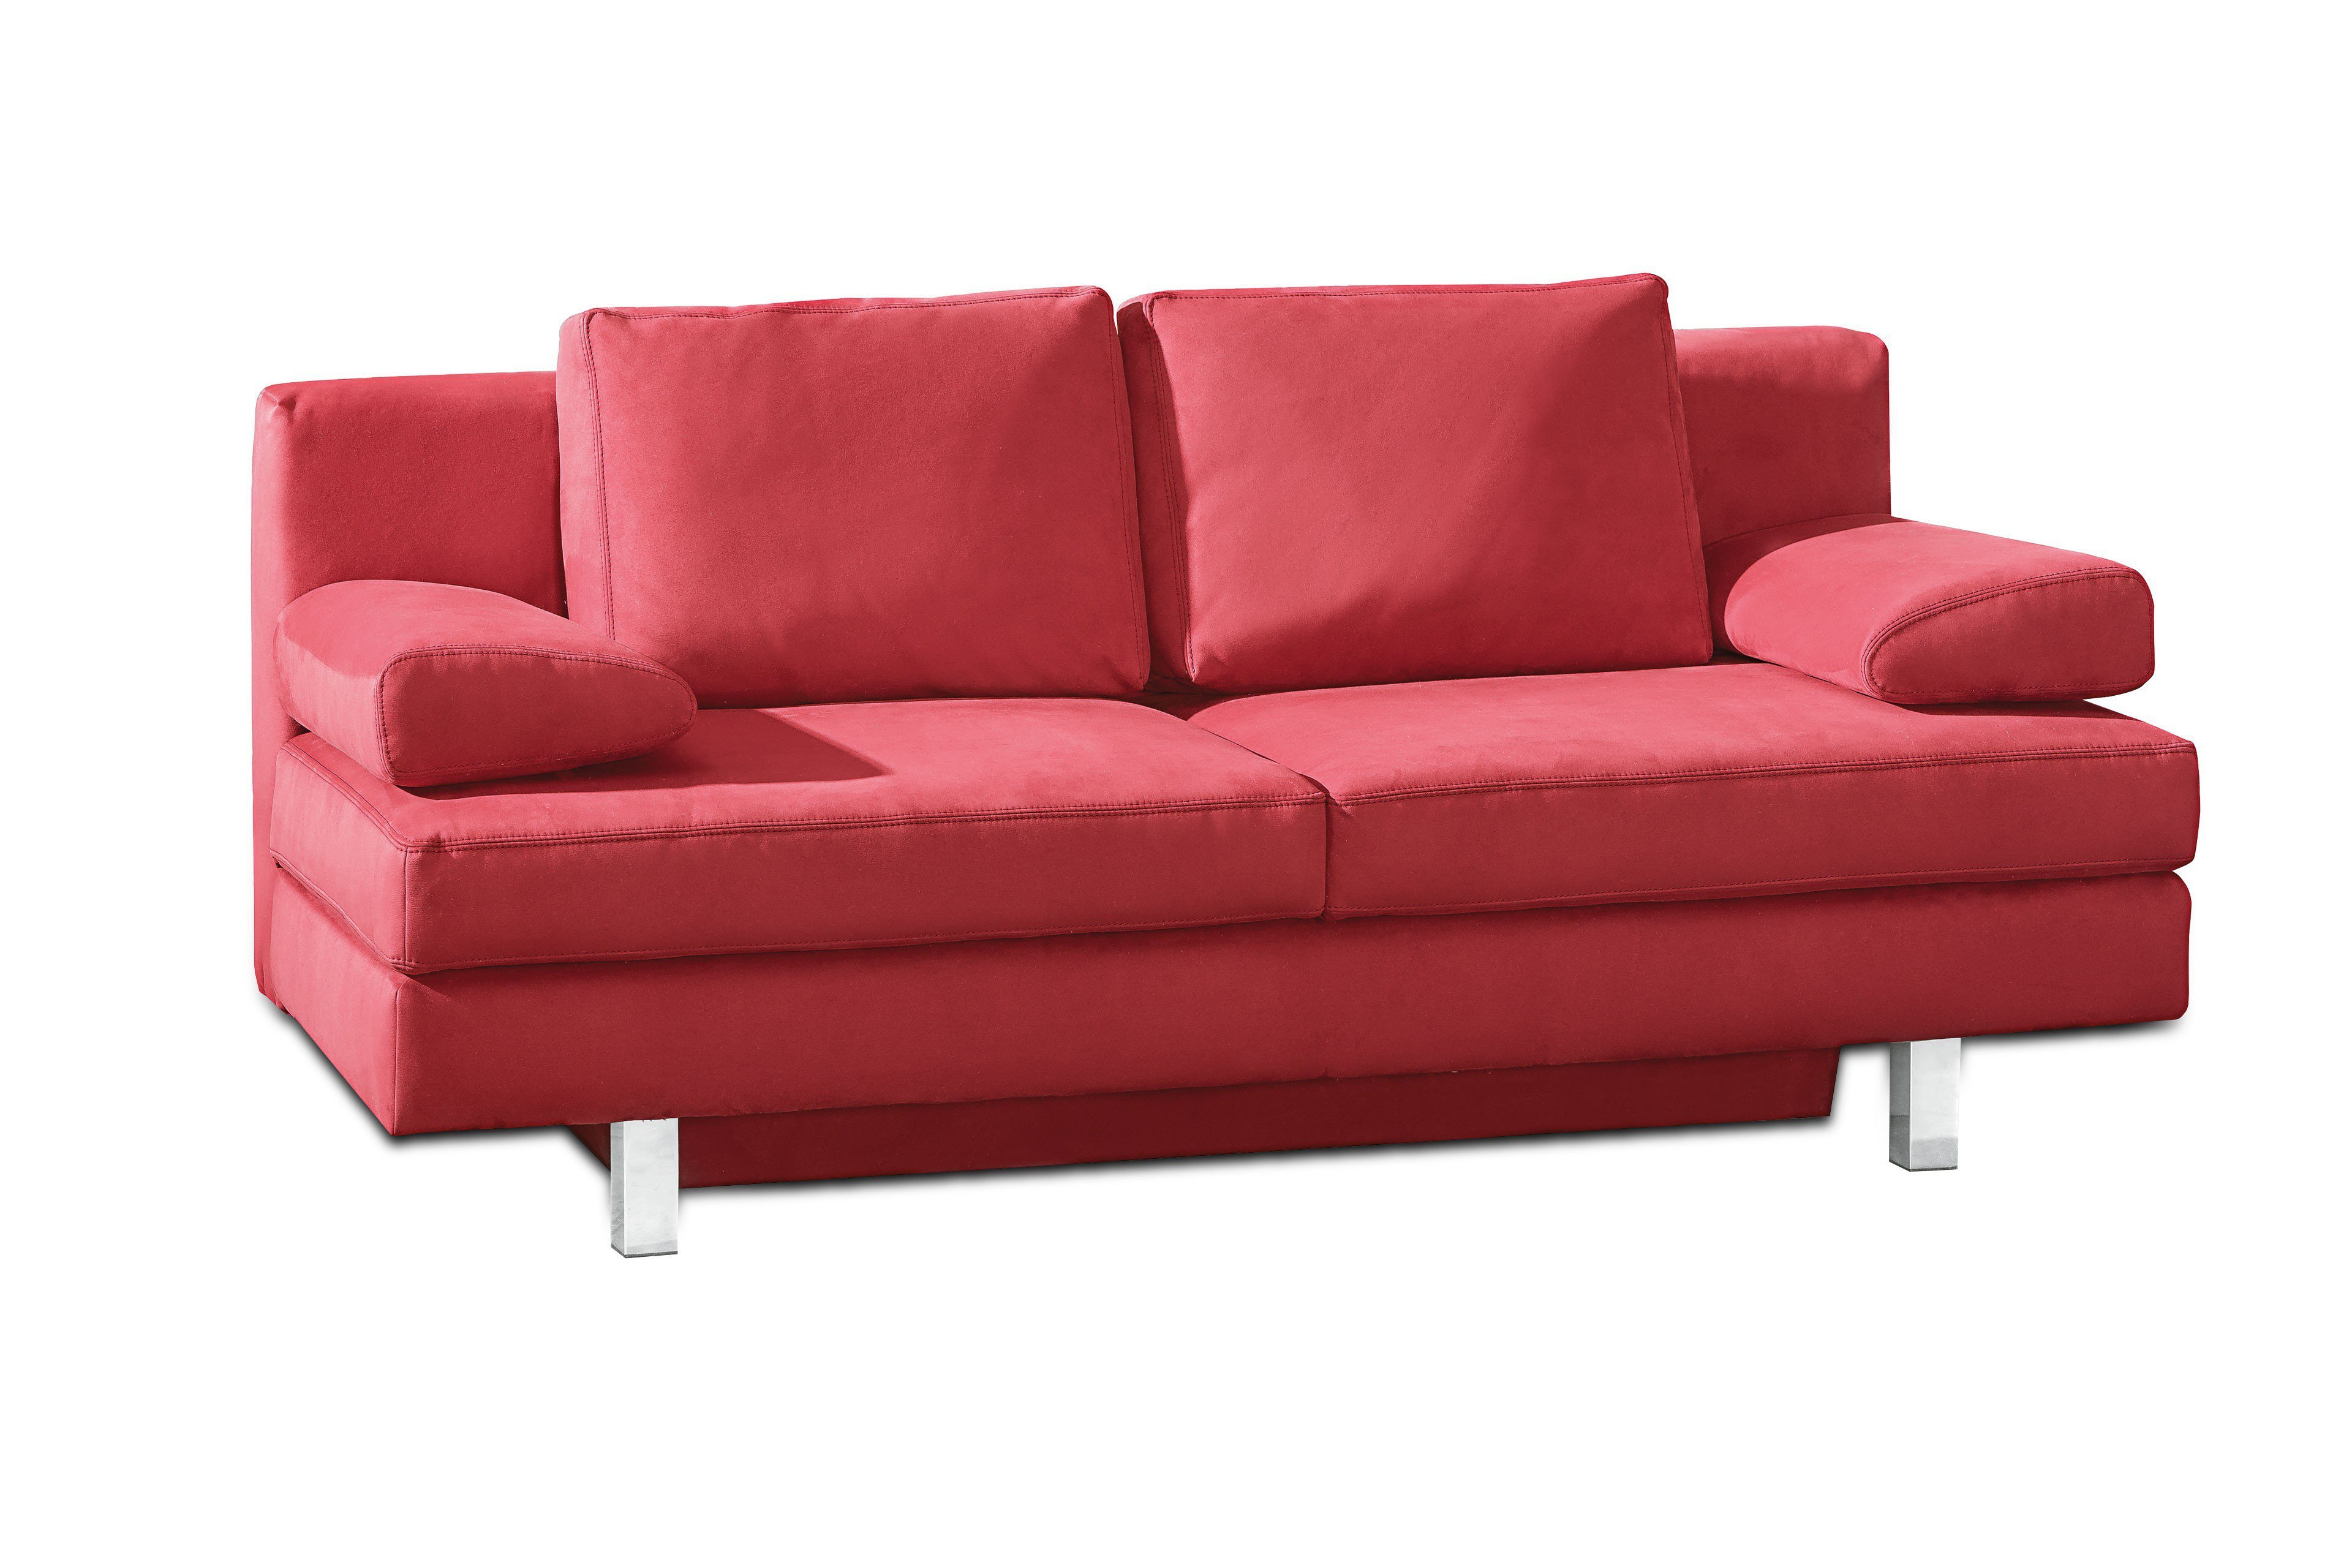 restyl rhonda schlafsofa in rot m bel letz ihr online shop. Black Bedroom Furniture Sets. Home Design Ideas